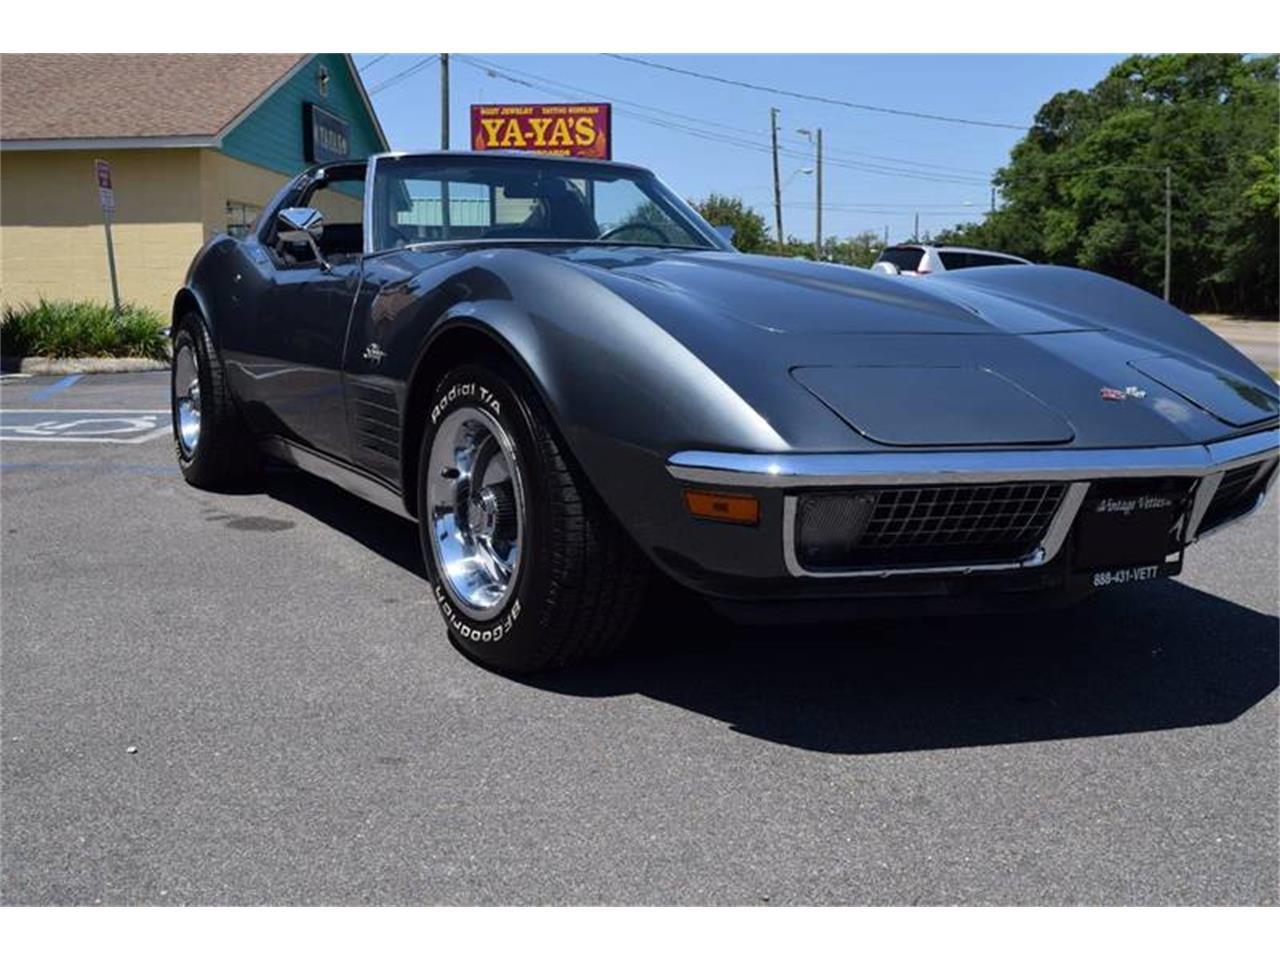 Large Picture of '70 Corvette located in Biloxi Mississippi - $39,500.00 - NEQX